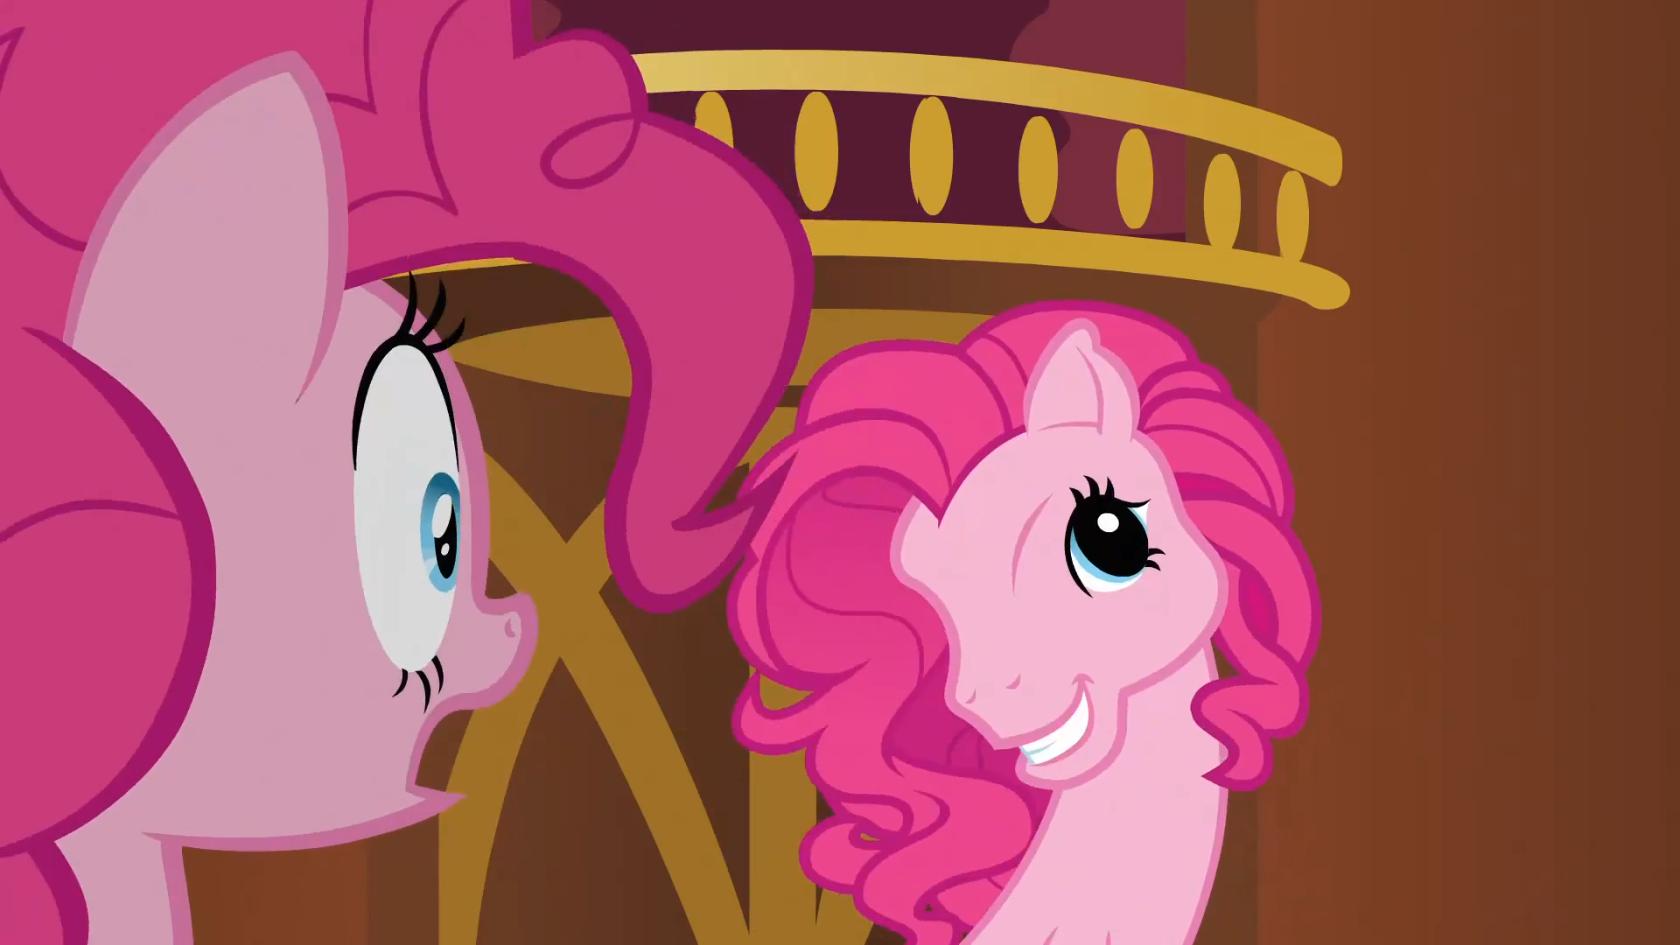 Too Many Pinkie Pies - My Little Pony Friendship is Magic Wiki